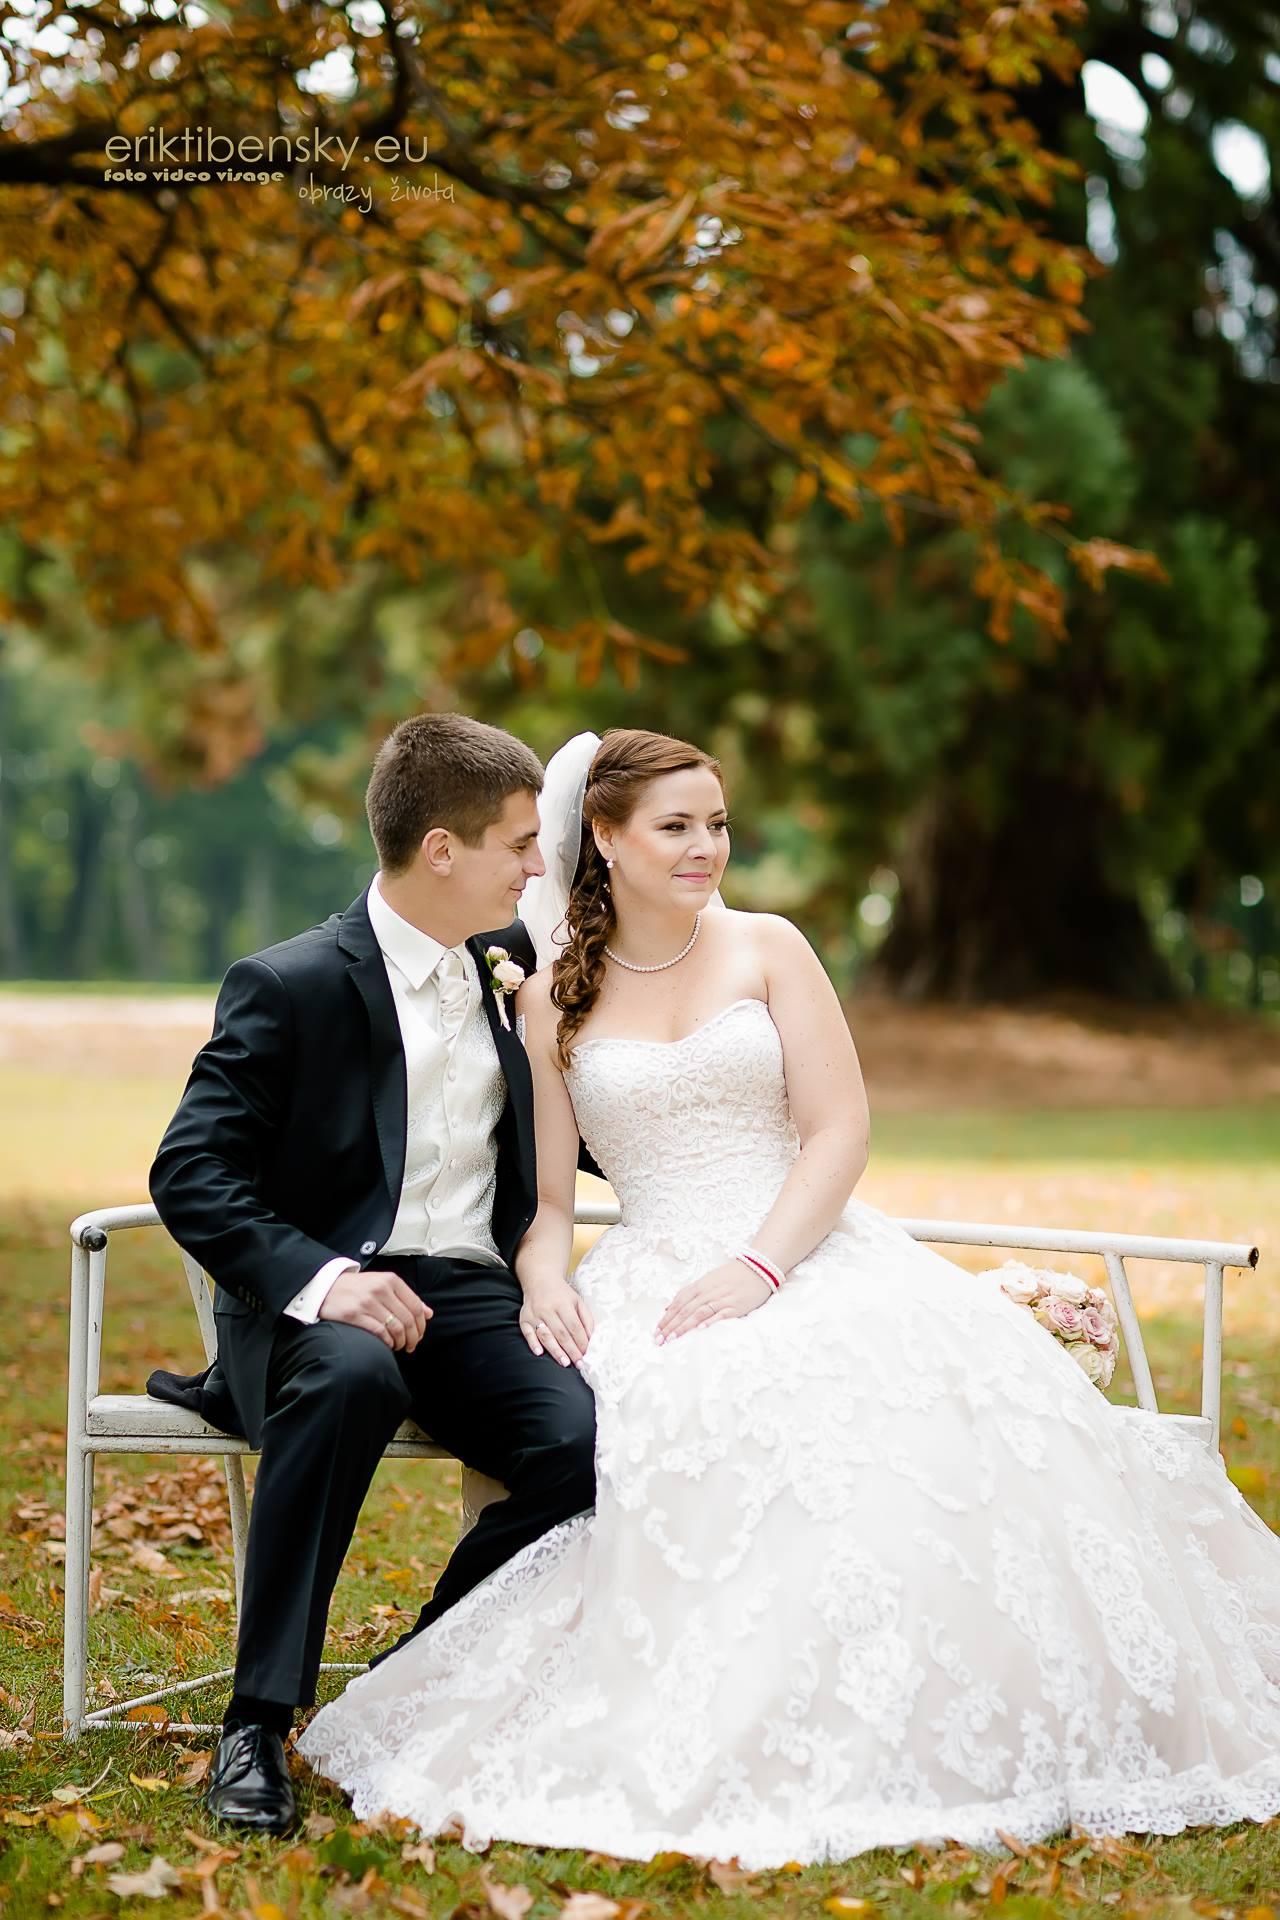 eriktibensky-eu-svadobny-fotograf-wedding-photographer-3087